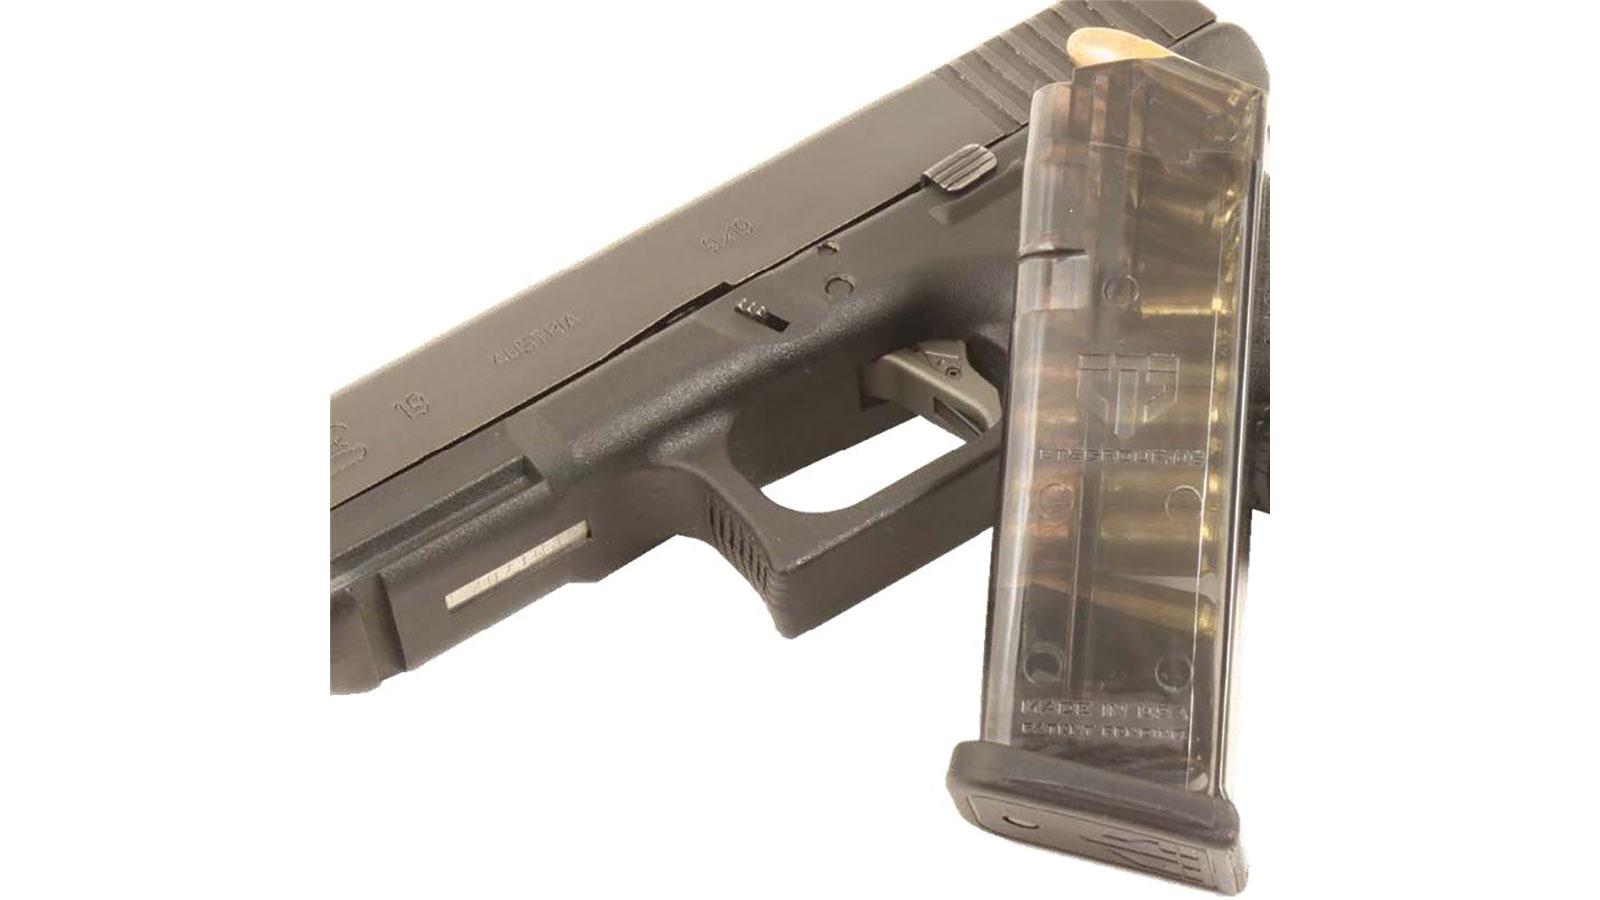 ETS Group GLK-19-10 Glock 19 9mm 10 rd G19|26 (Gen 1-4) Polymer Clear Finish